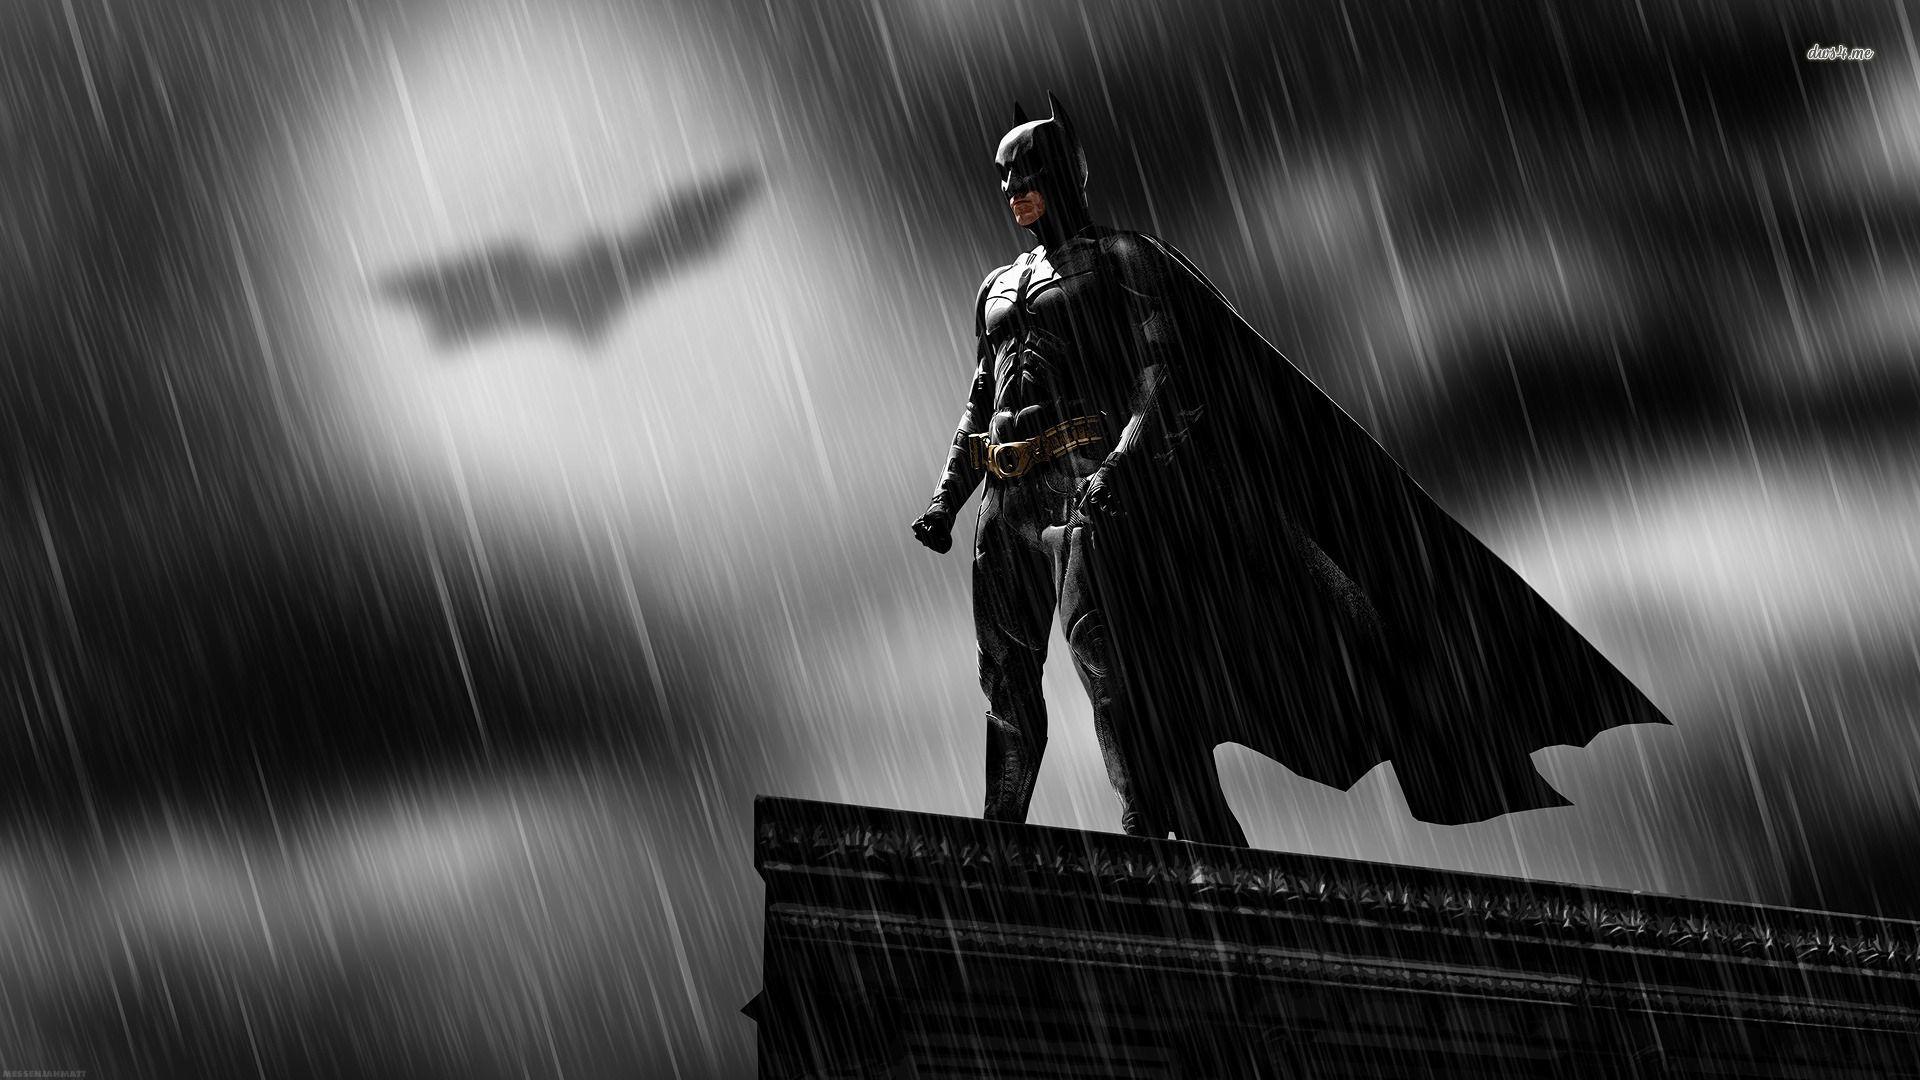 Batman Hd Wallpaper Batman Wallpaper Batman Backgrounds Batman